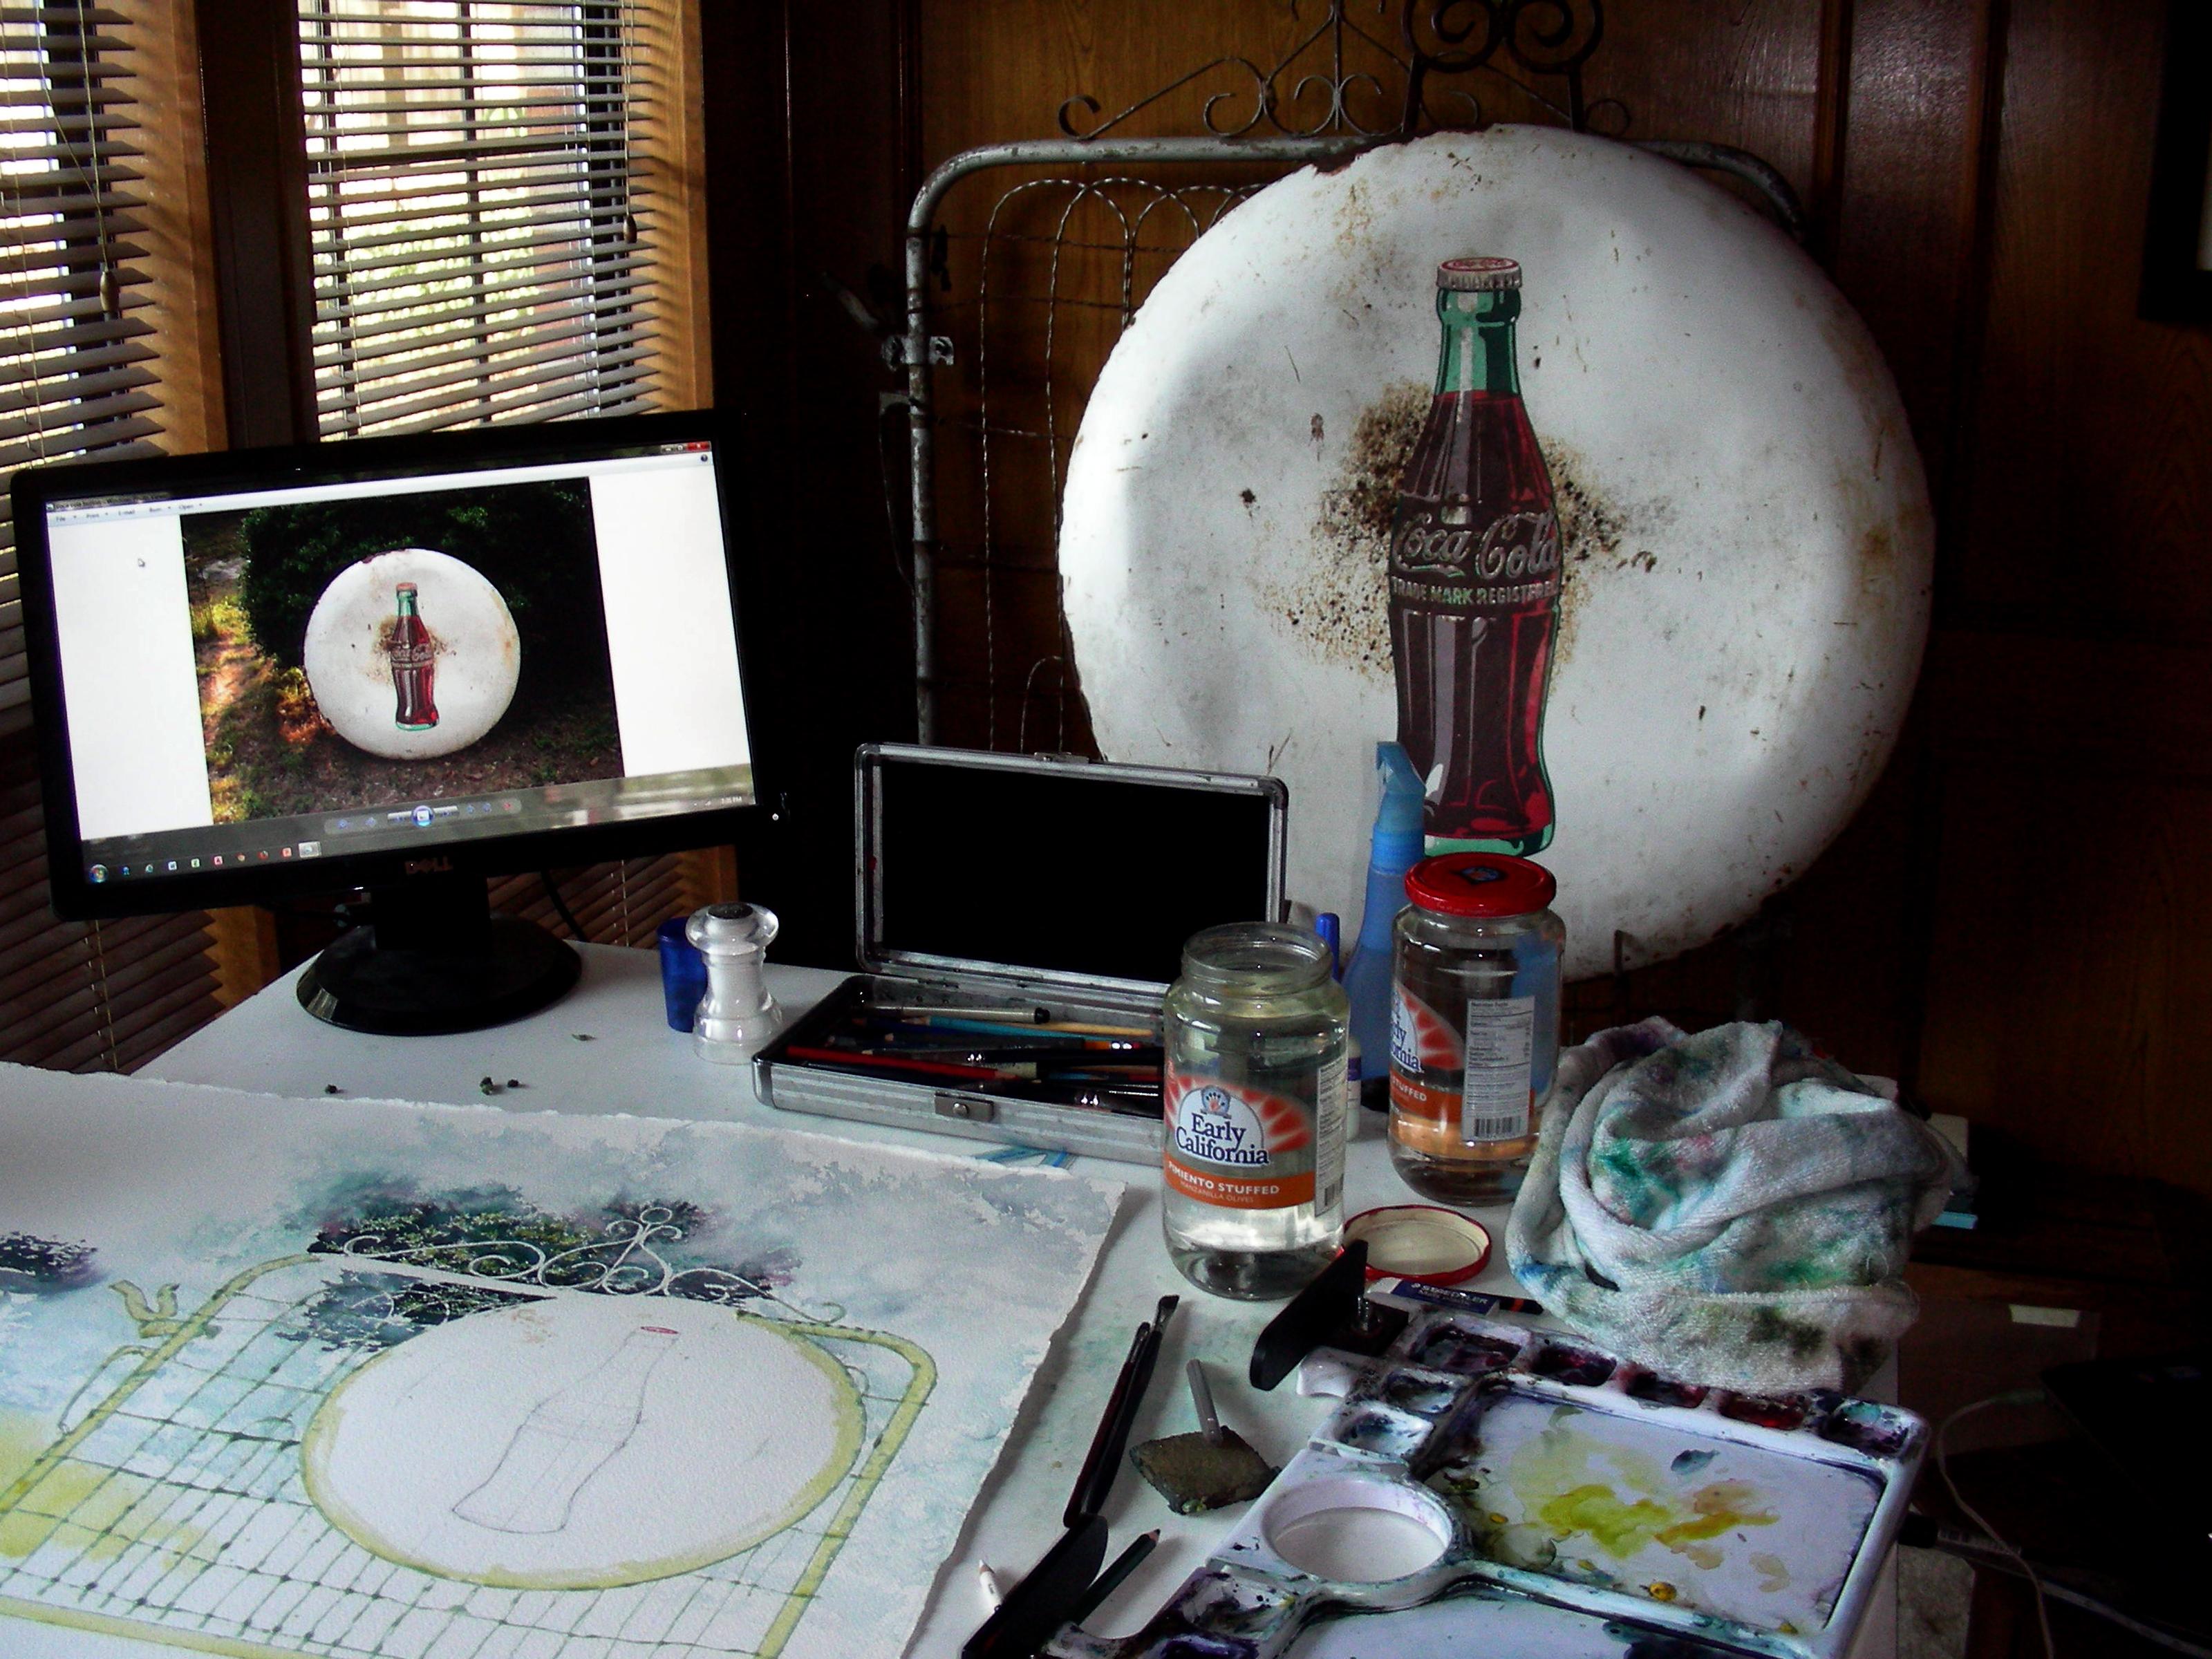 Still Life Set Up in the Studio